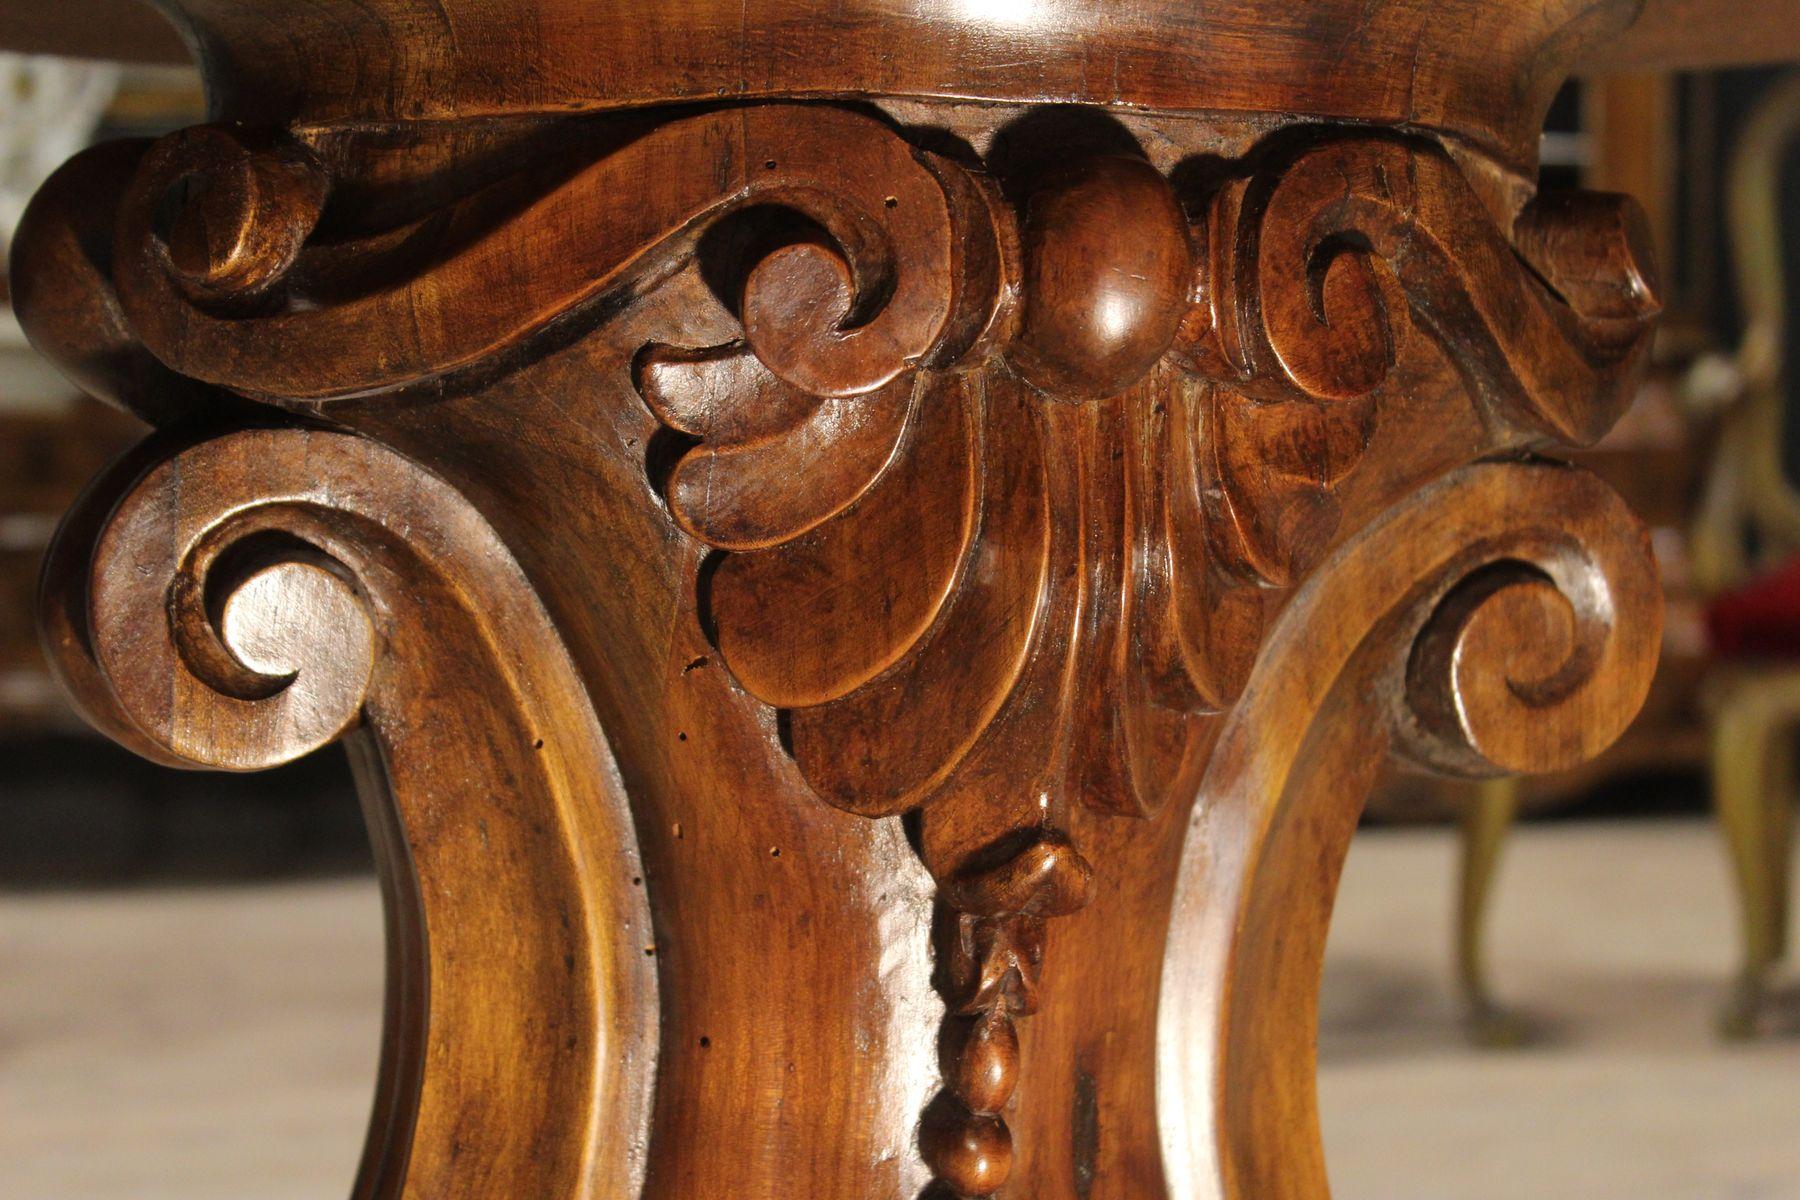 Italian Walnut Dining Table Vintage Italian Walnut And Onyx Dining Table For Sale At Pamono